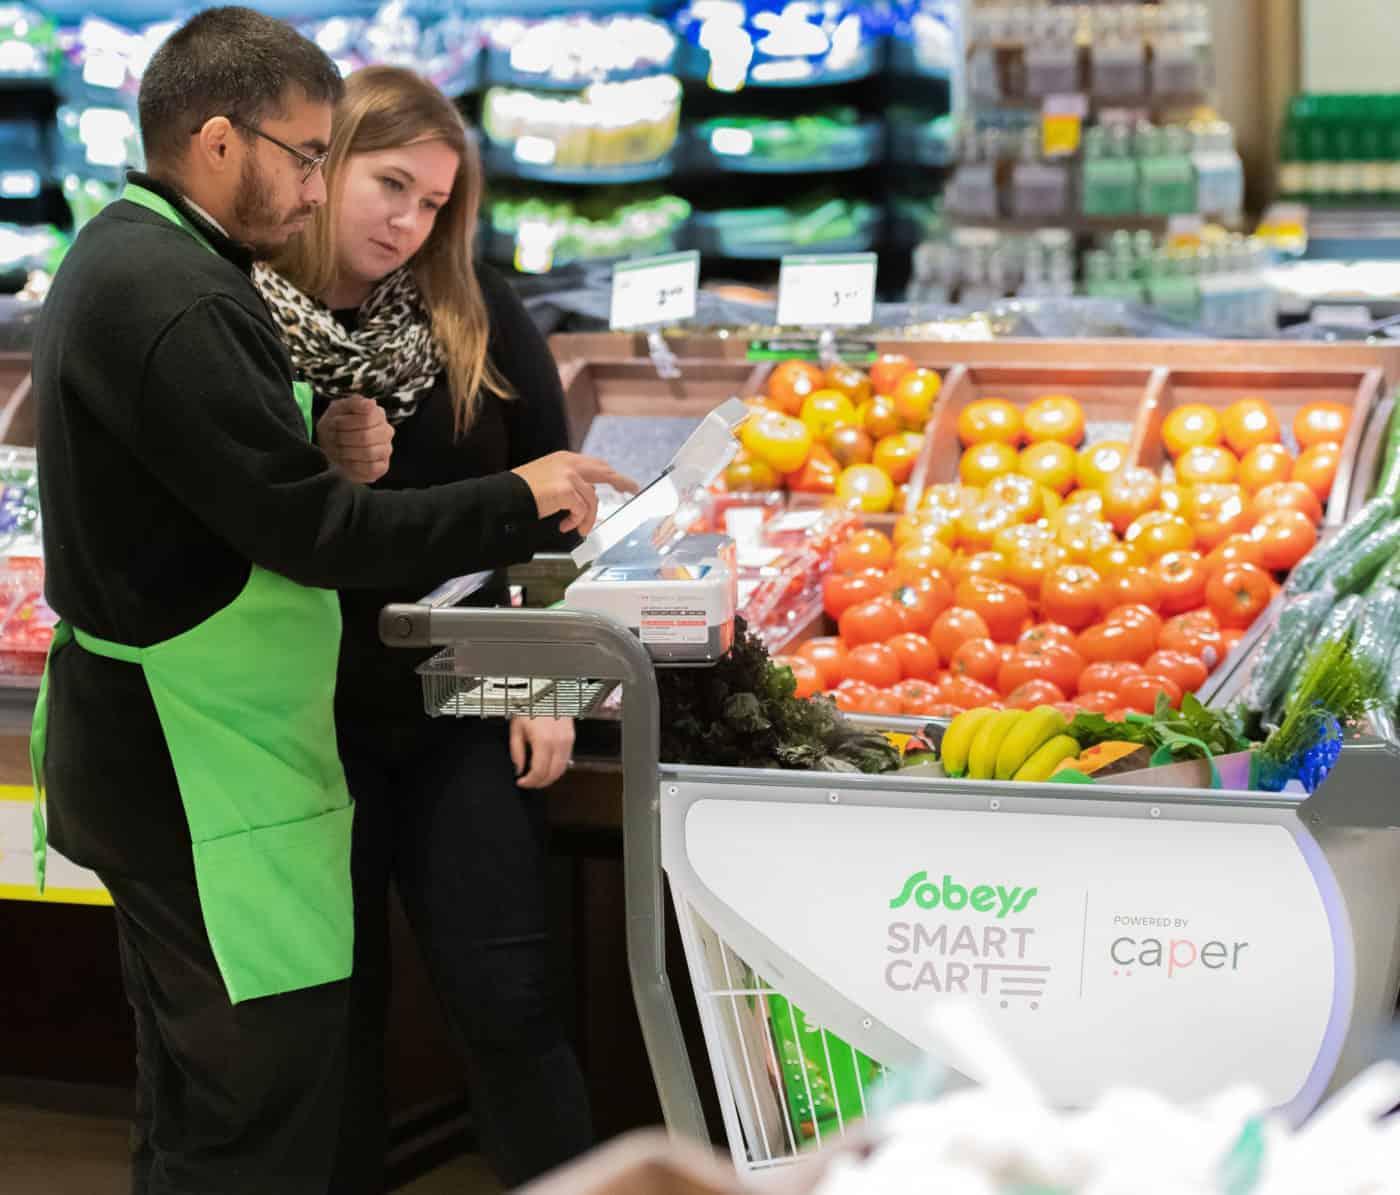 smart shopping cart- Caper ai